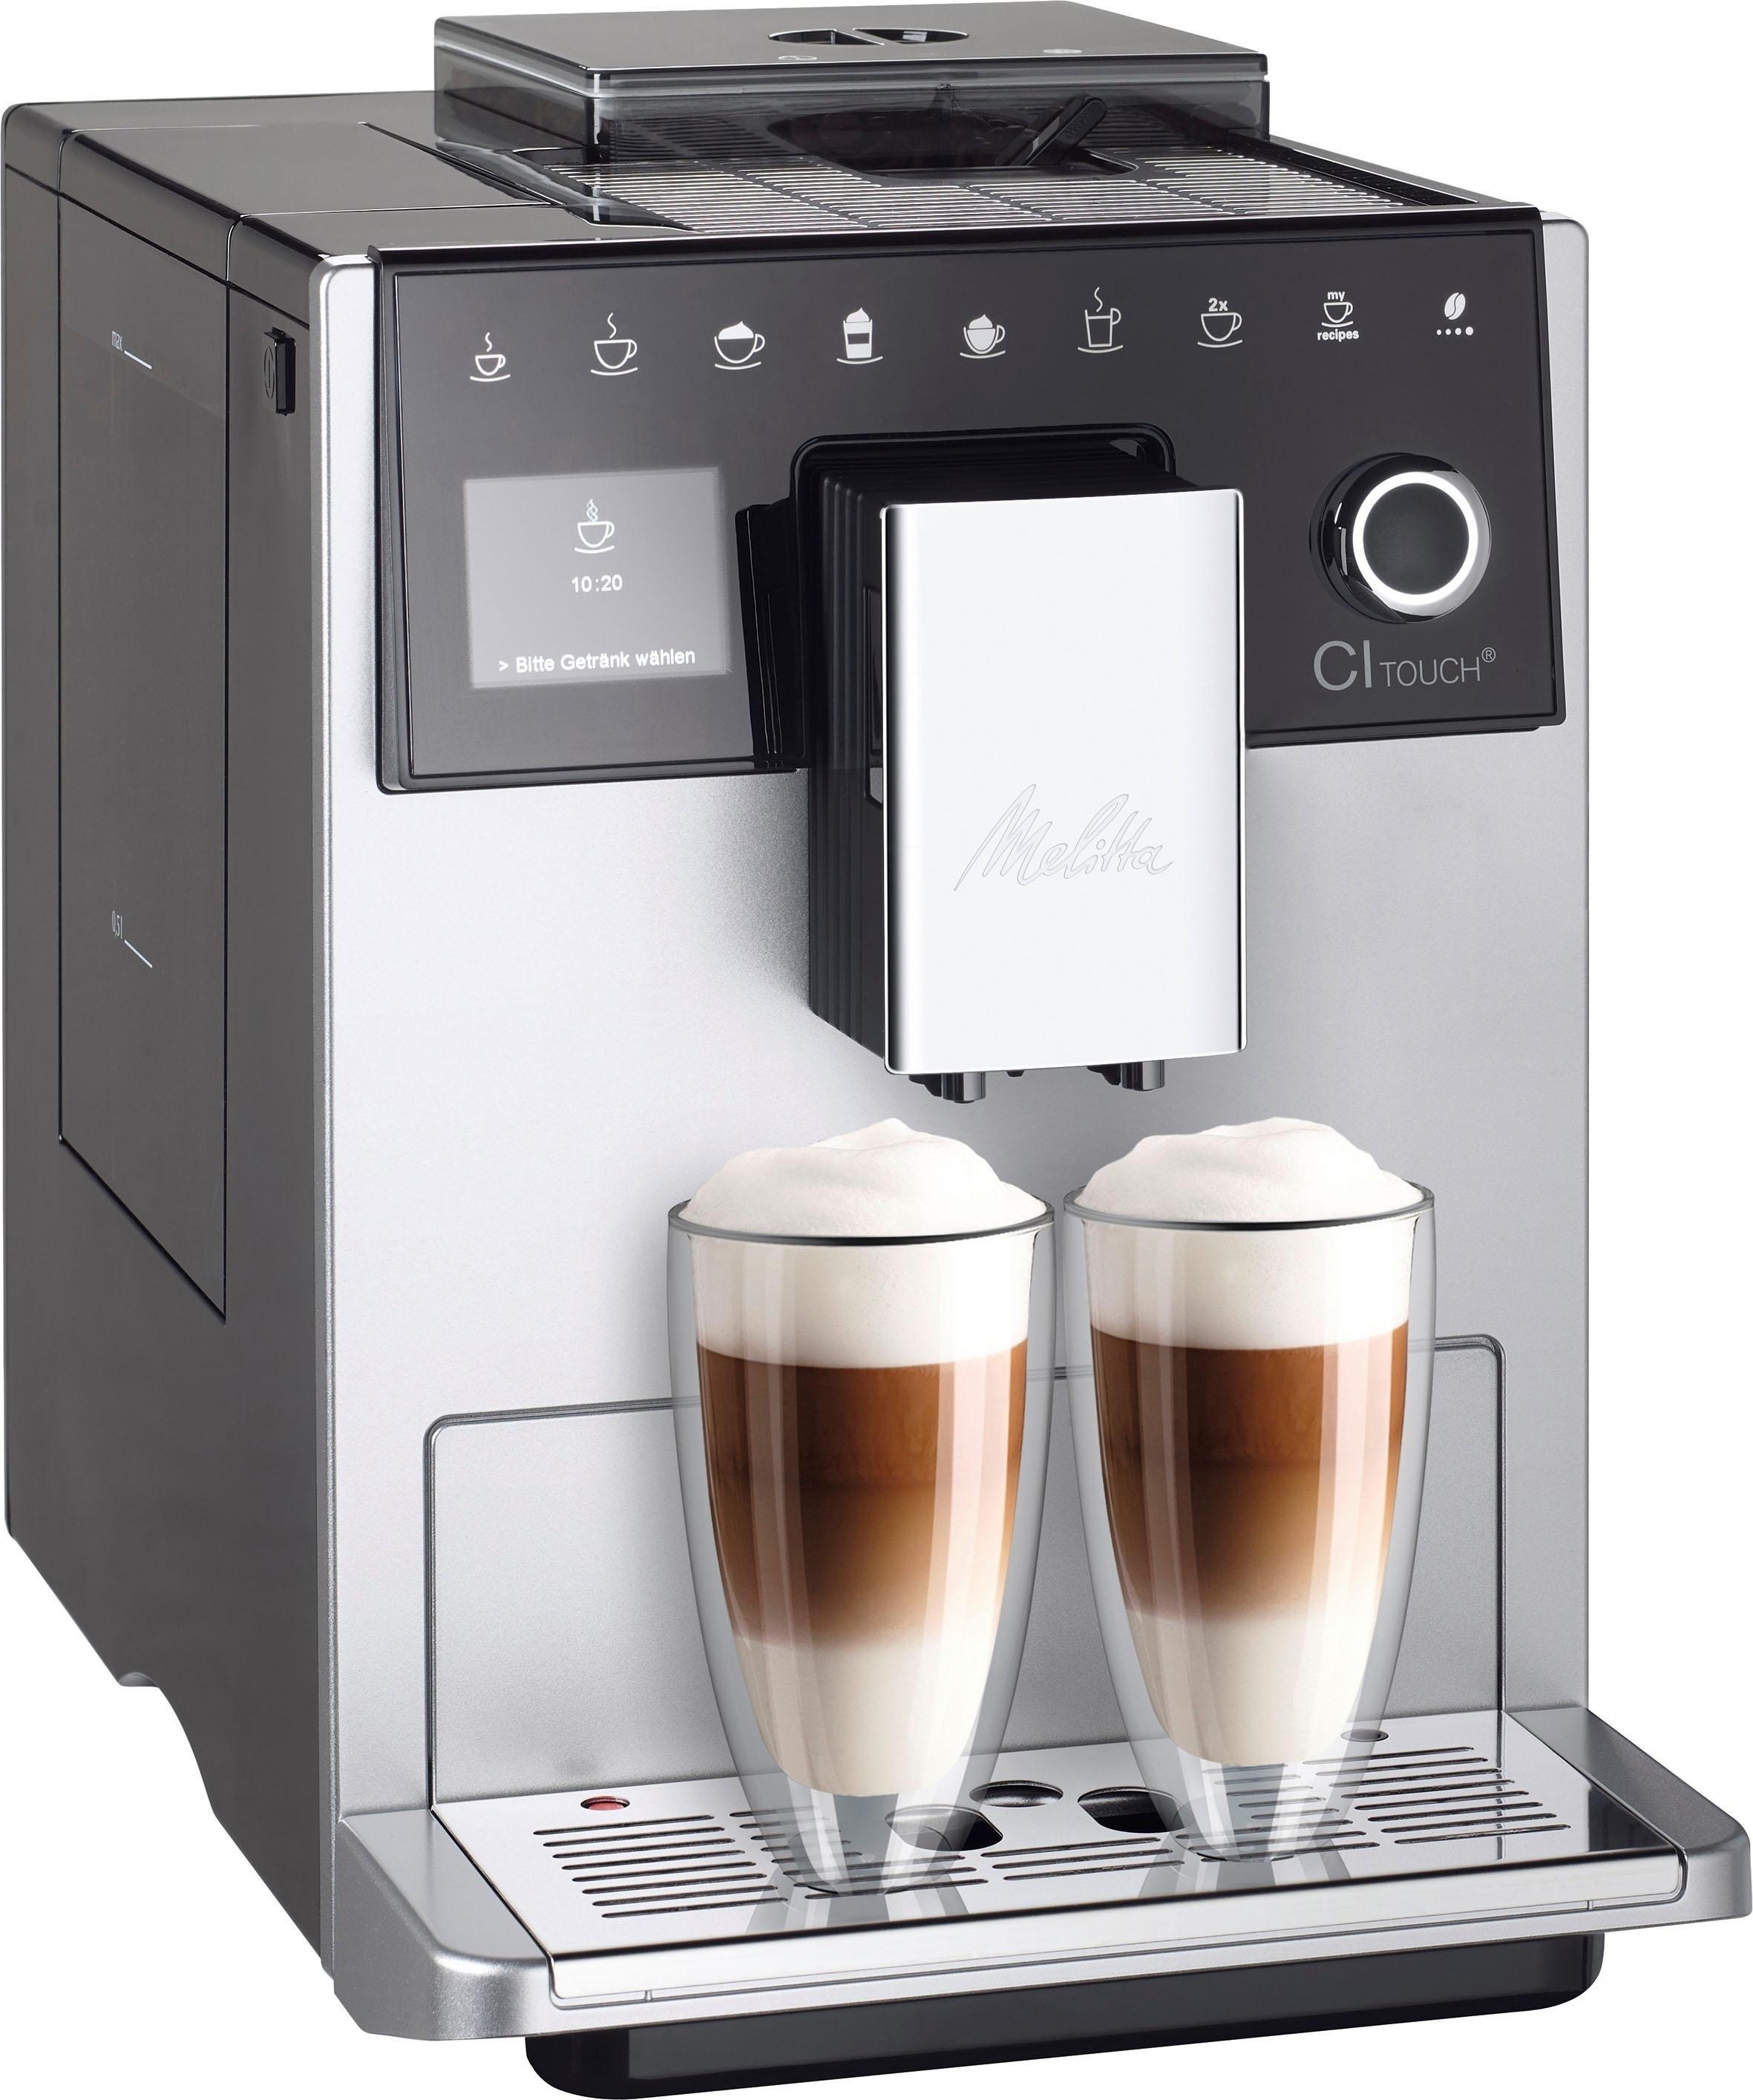 Melitta volautomatisch koffiezetapparaat Melitta® CI Touch® F 630-101, zilver/zwart - verschillende betaalmethodes